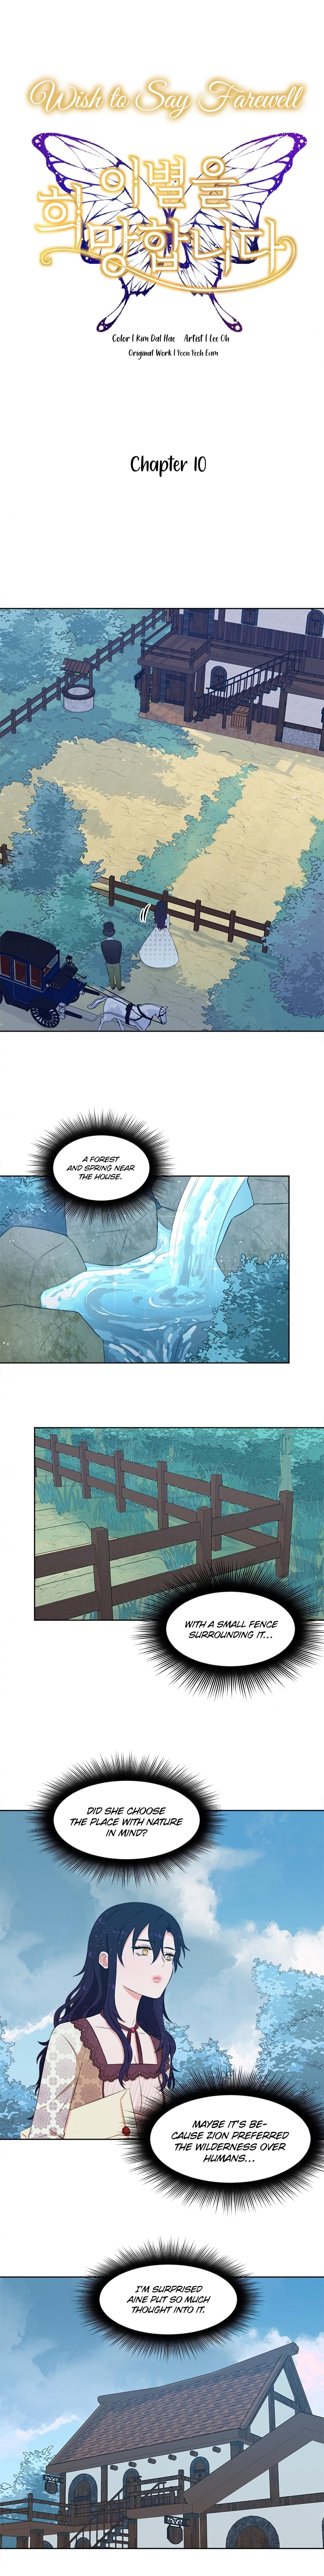 https://img2.nineanime.com/comics/pic4/34/37666/1941549/02795920dd6e7b161729a3d9c1a5ed61.jpg Page 1